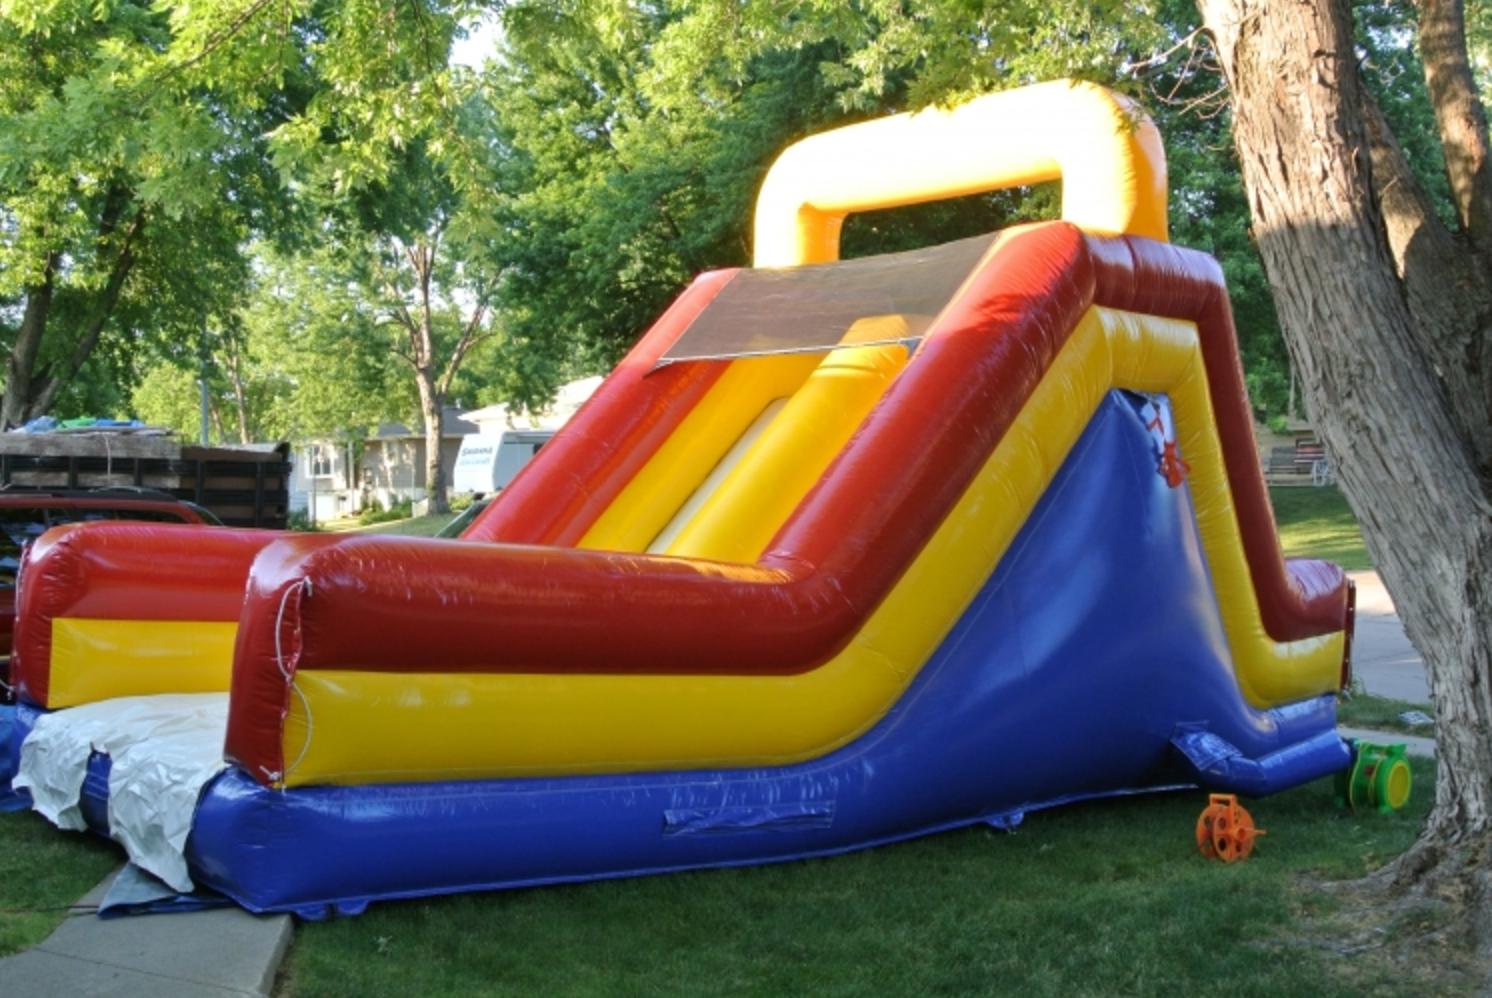 Rock Bouncer For Sale >> Rockwall Slide - Bounce Houses Omaha | Bounce Omaha ...